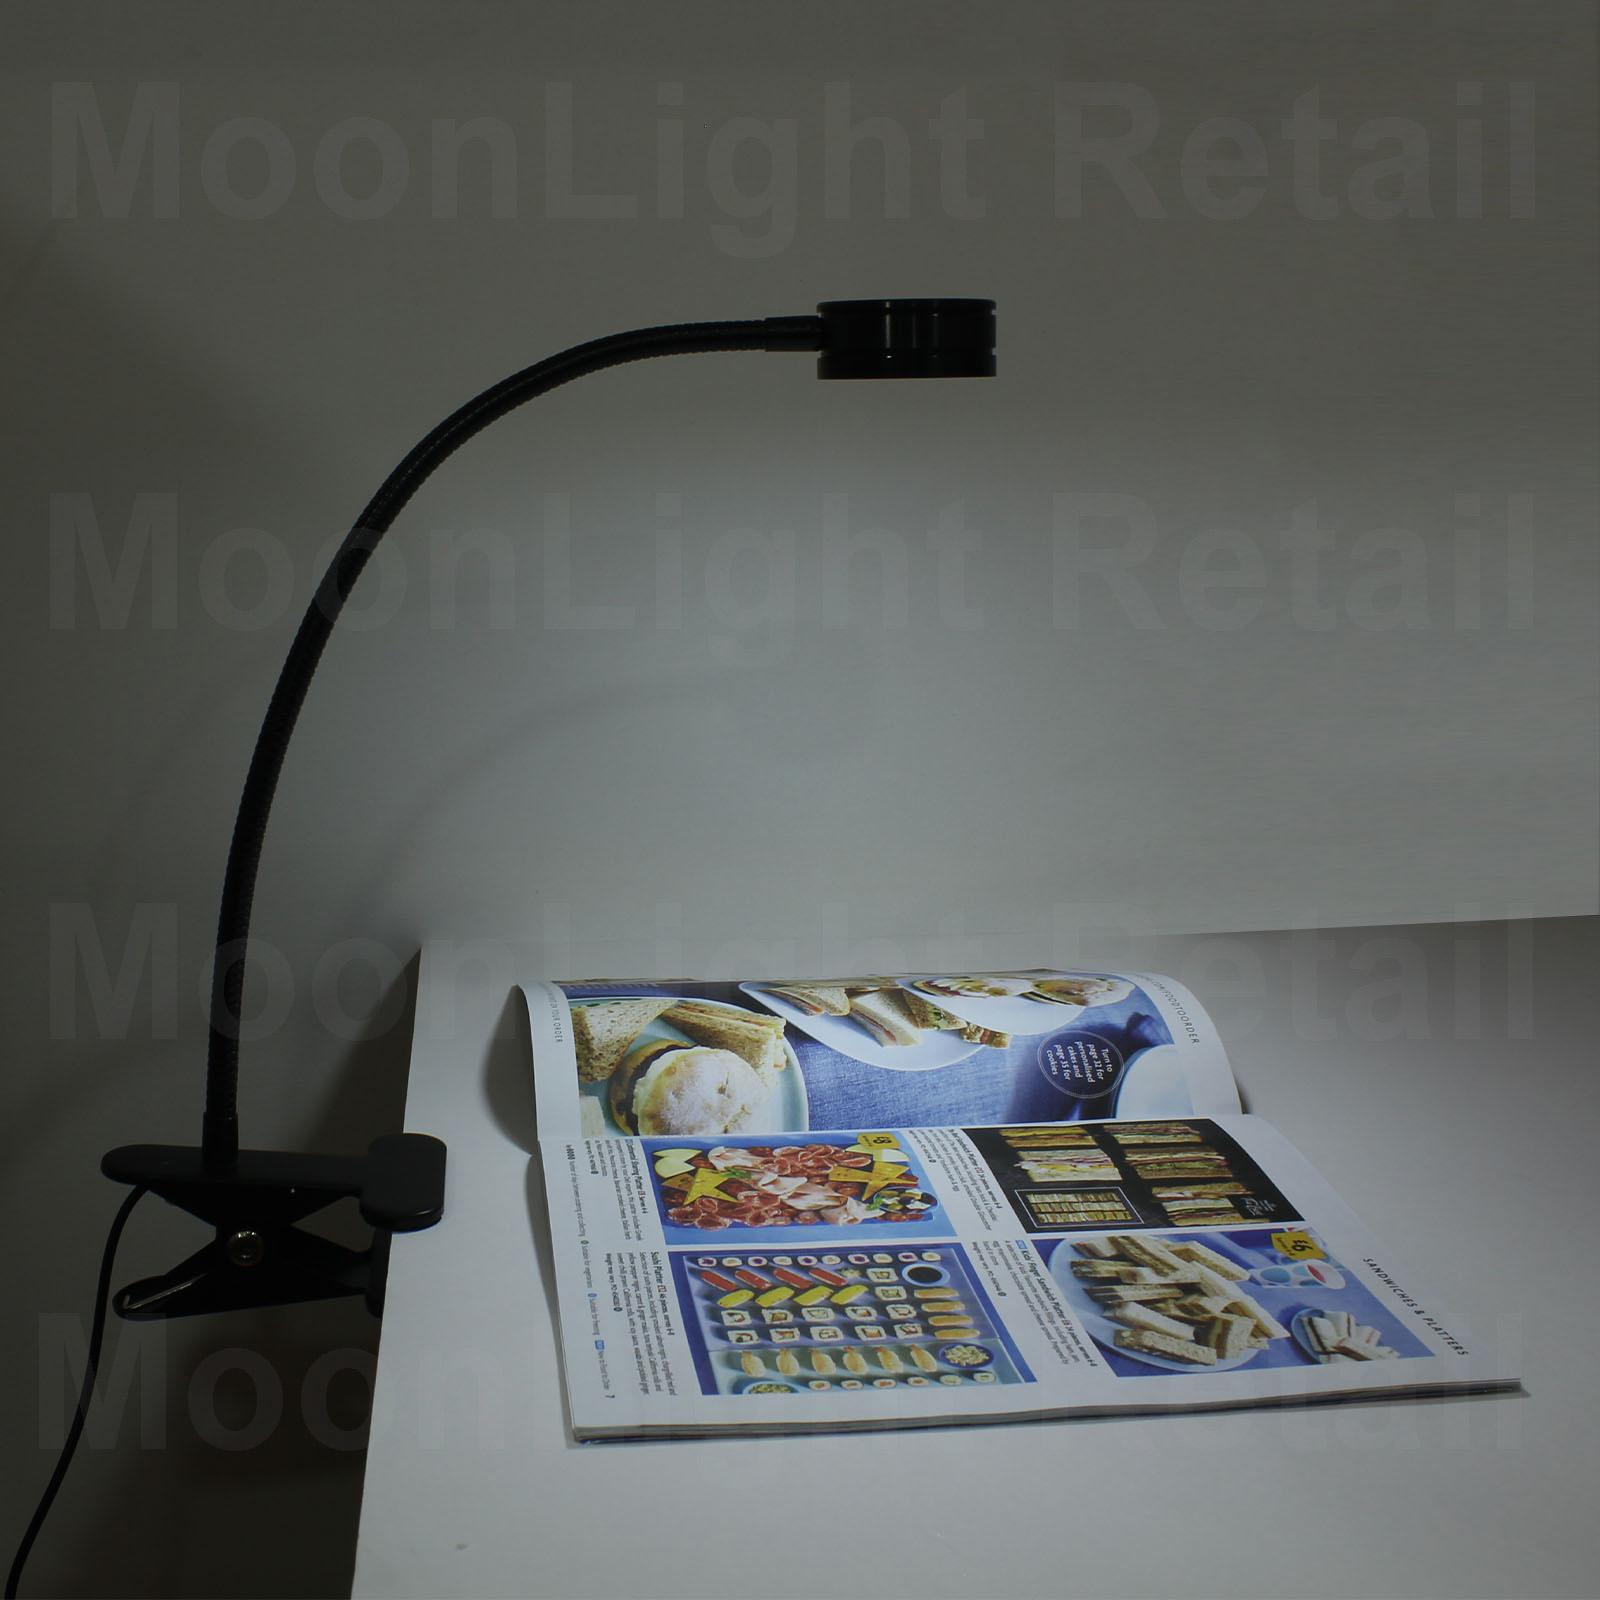 Modern Adjustable Clamp Clip On Led Reading Usb Table Desk Lamp Light Black Moonlight Retail